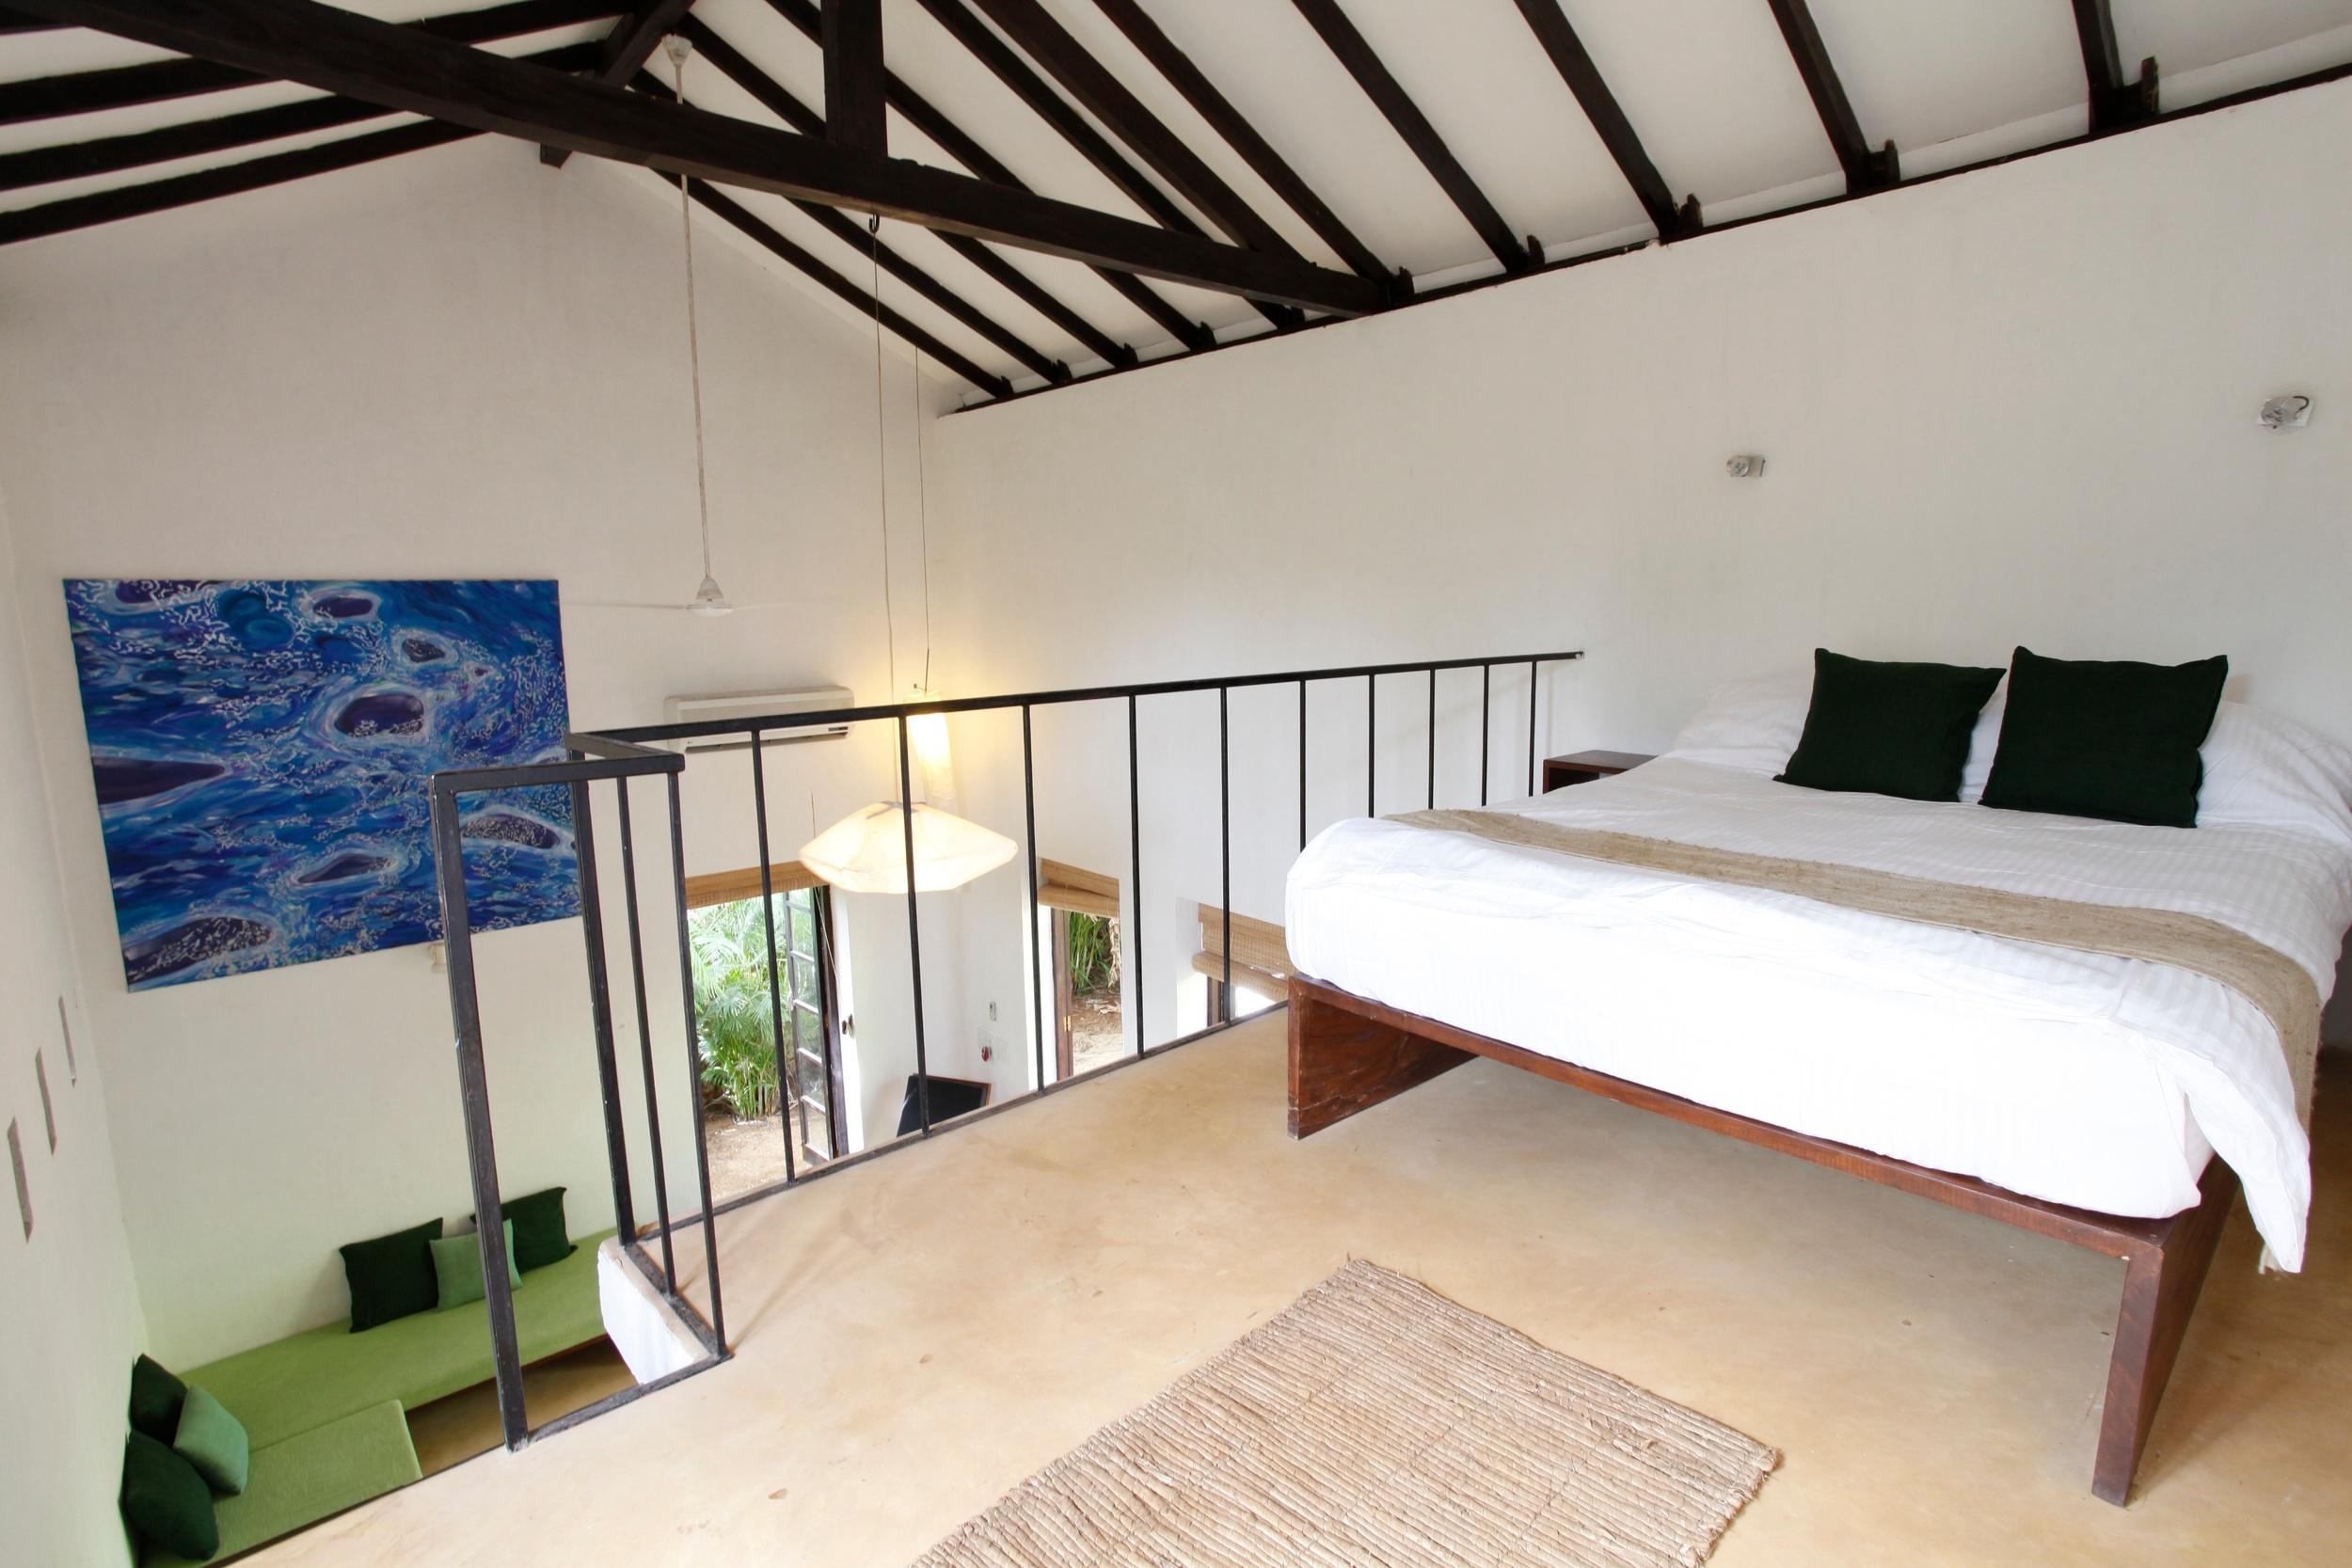 Kaju Varo's eco-luxury suites